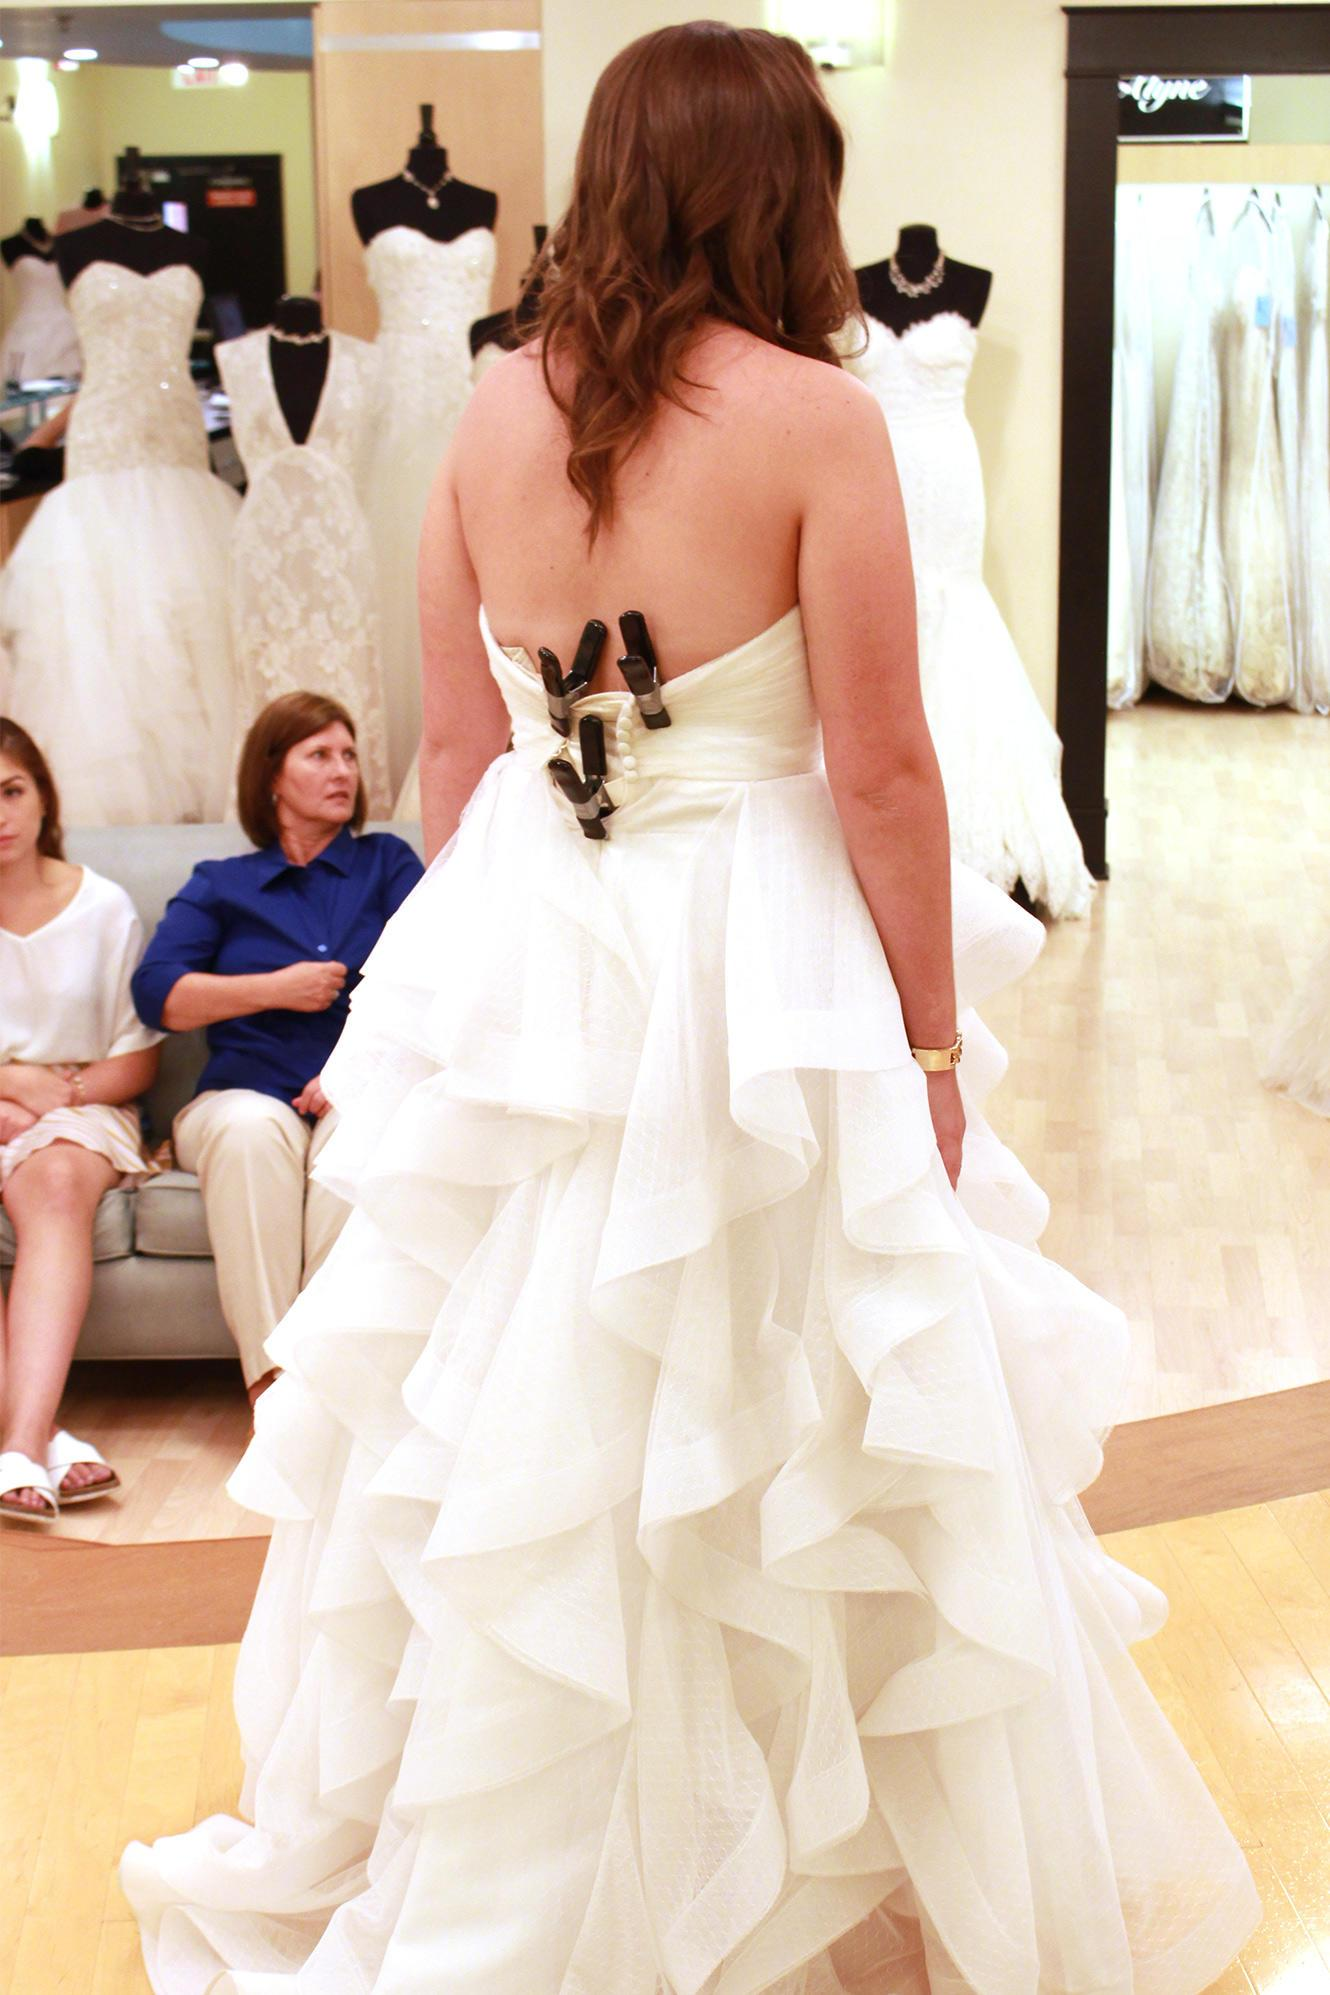 Berühmt Plus Size Brautkleider Nixeart Fotos - Brautkleider Ideen ...